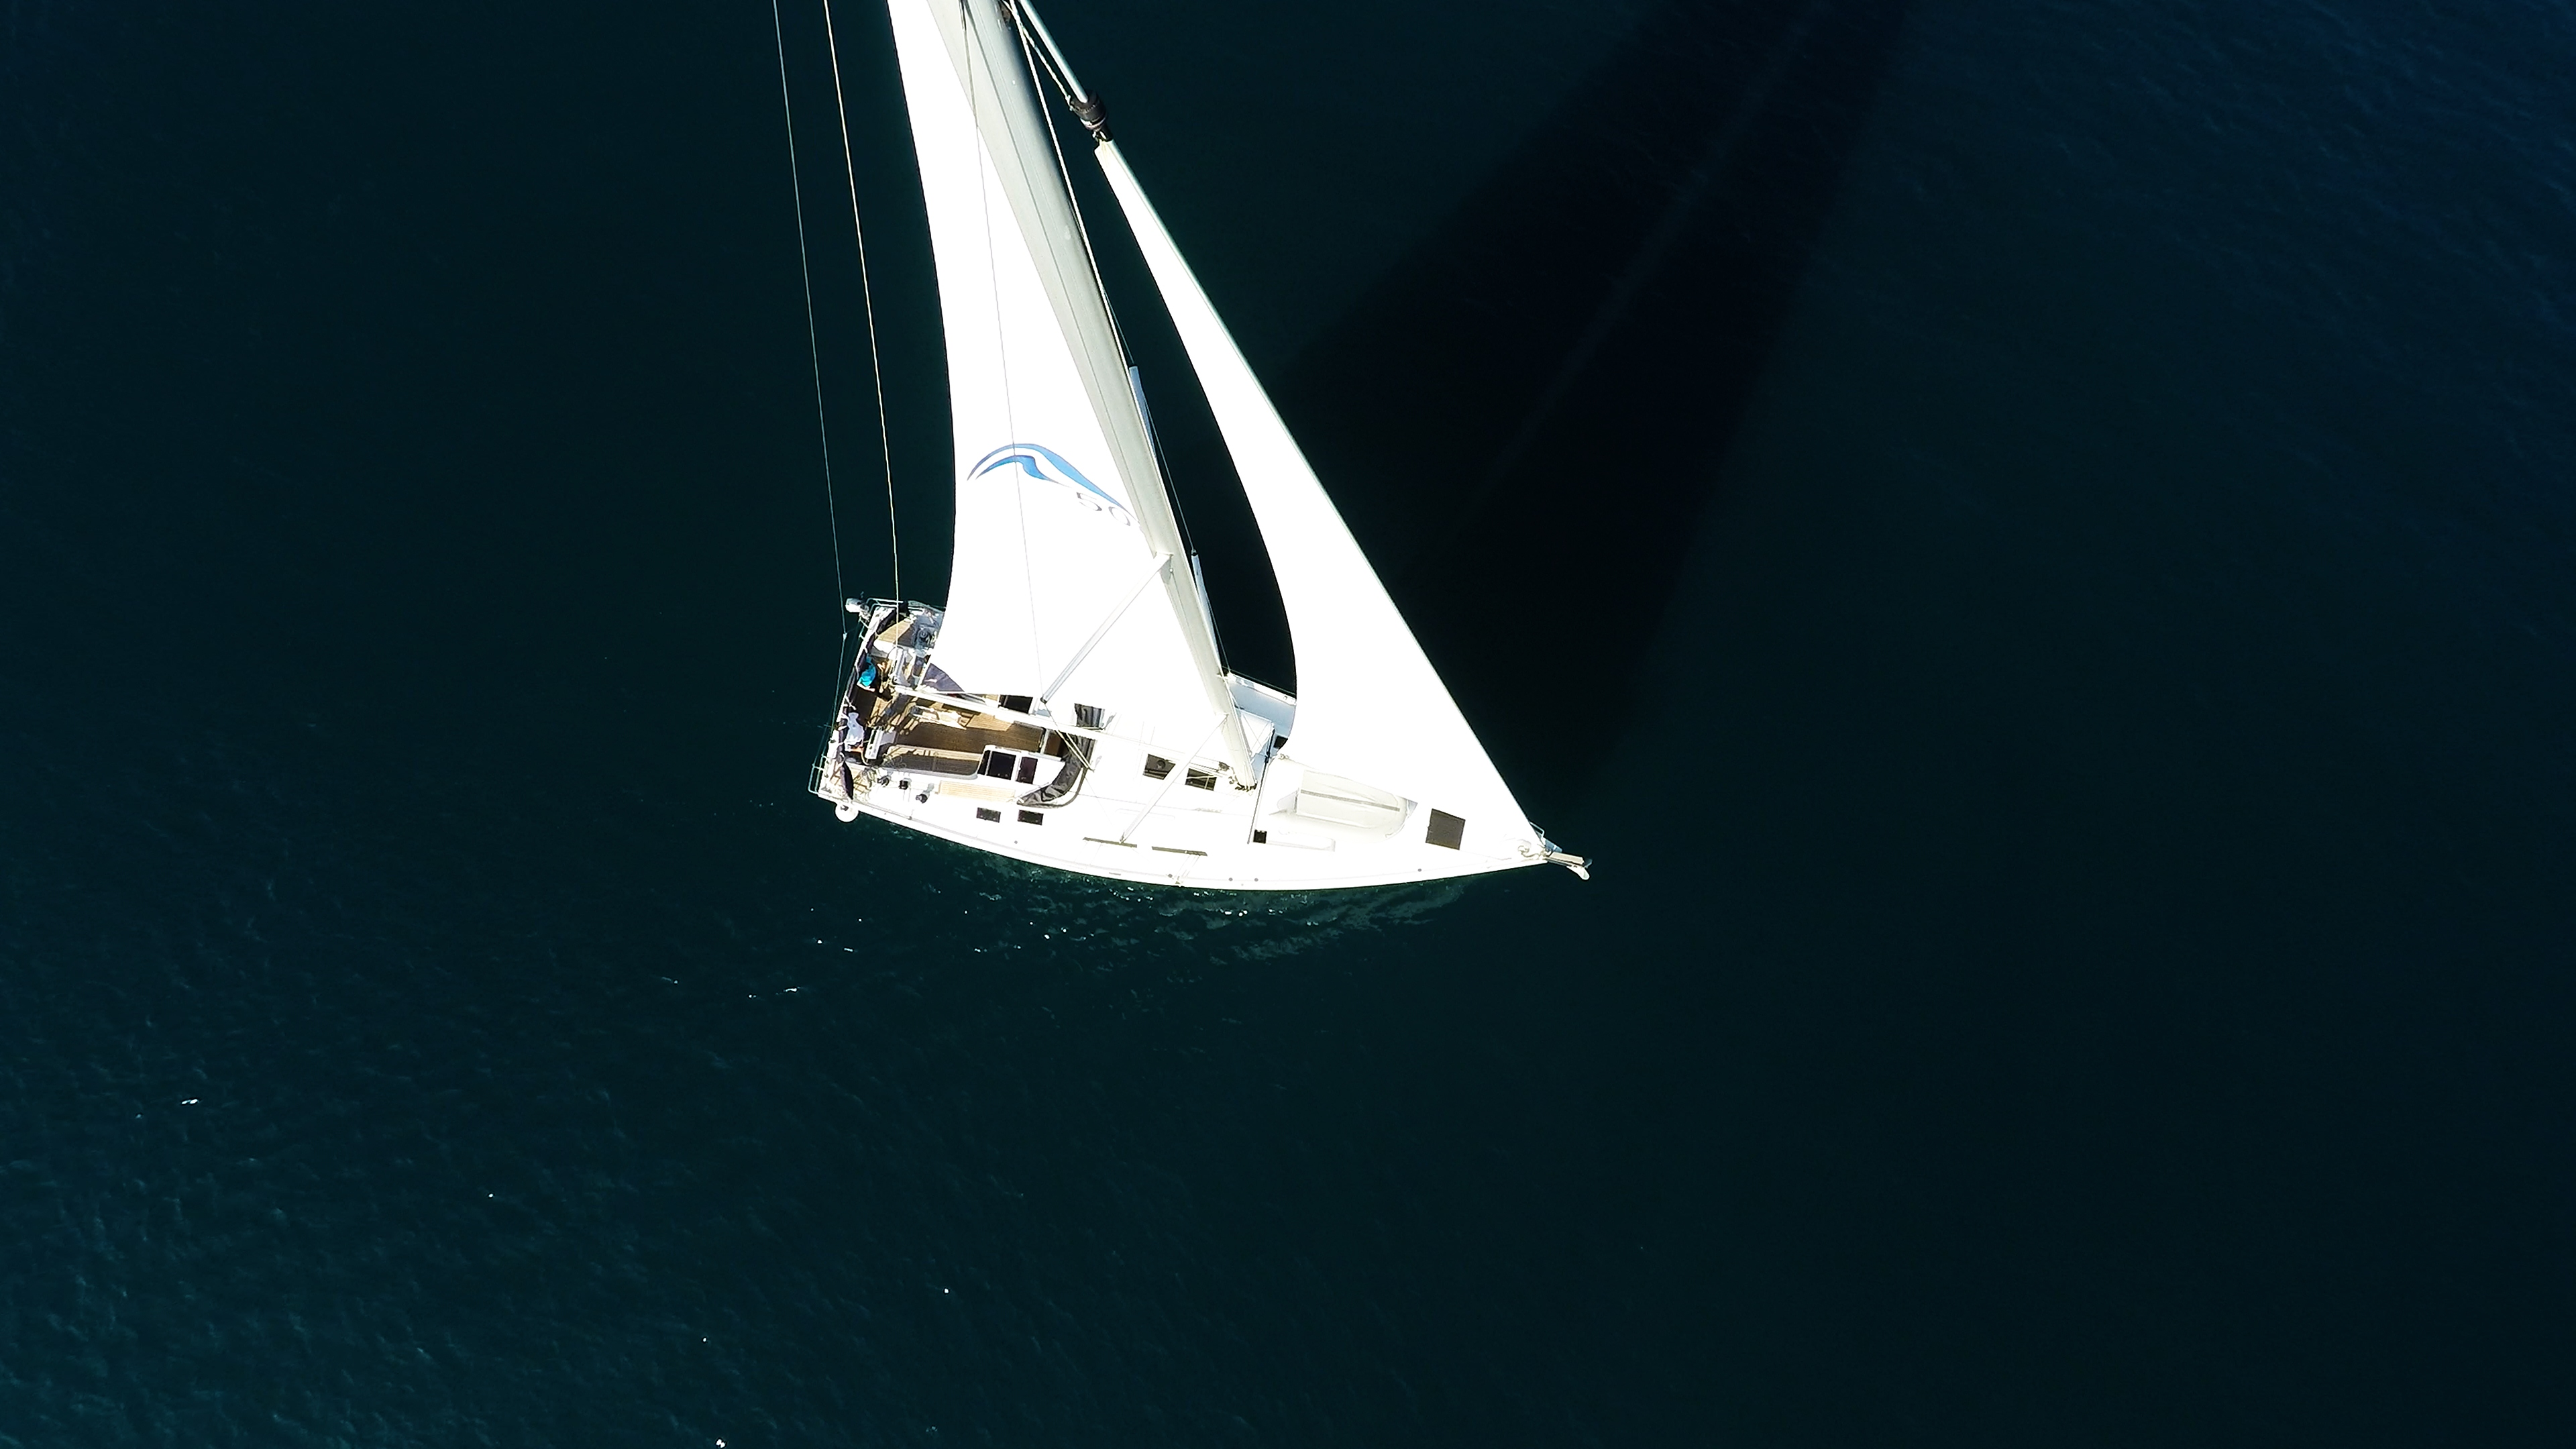 barcha a vela Hanse 505 da sopra barca a vela barca vele veleggiare ponte pozzetto mare